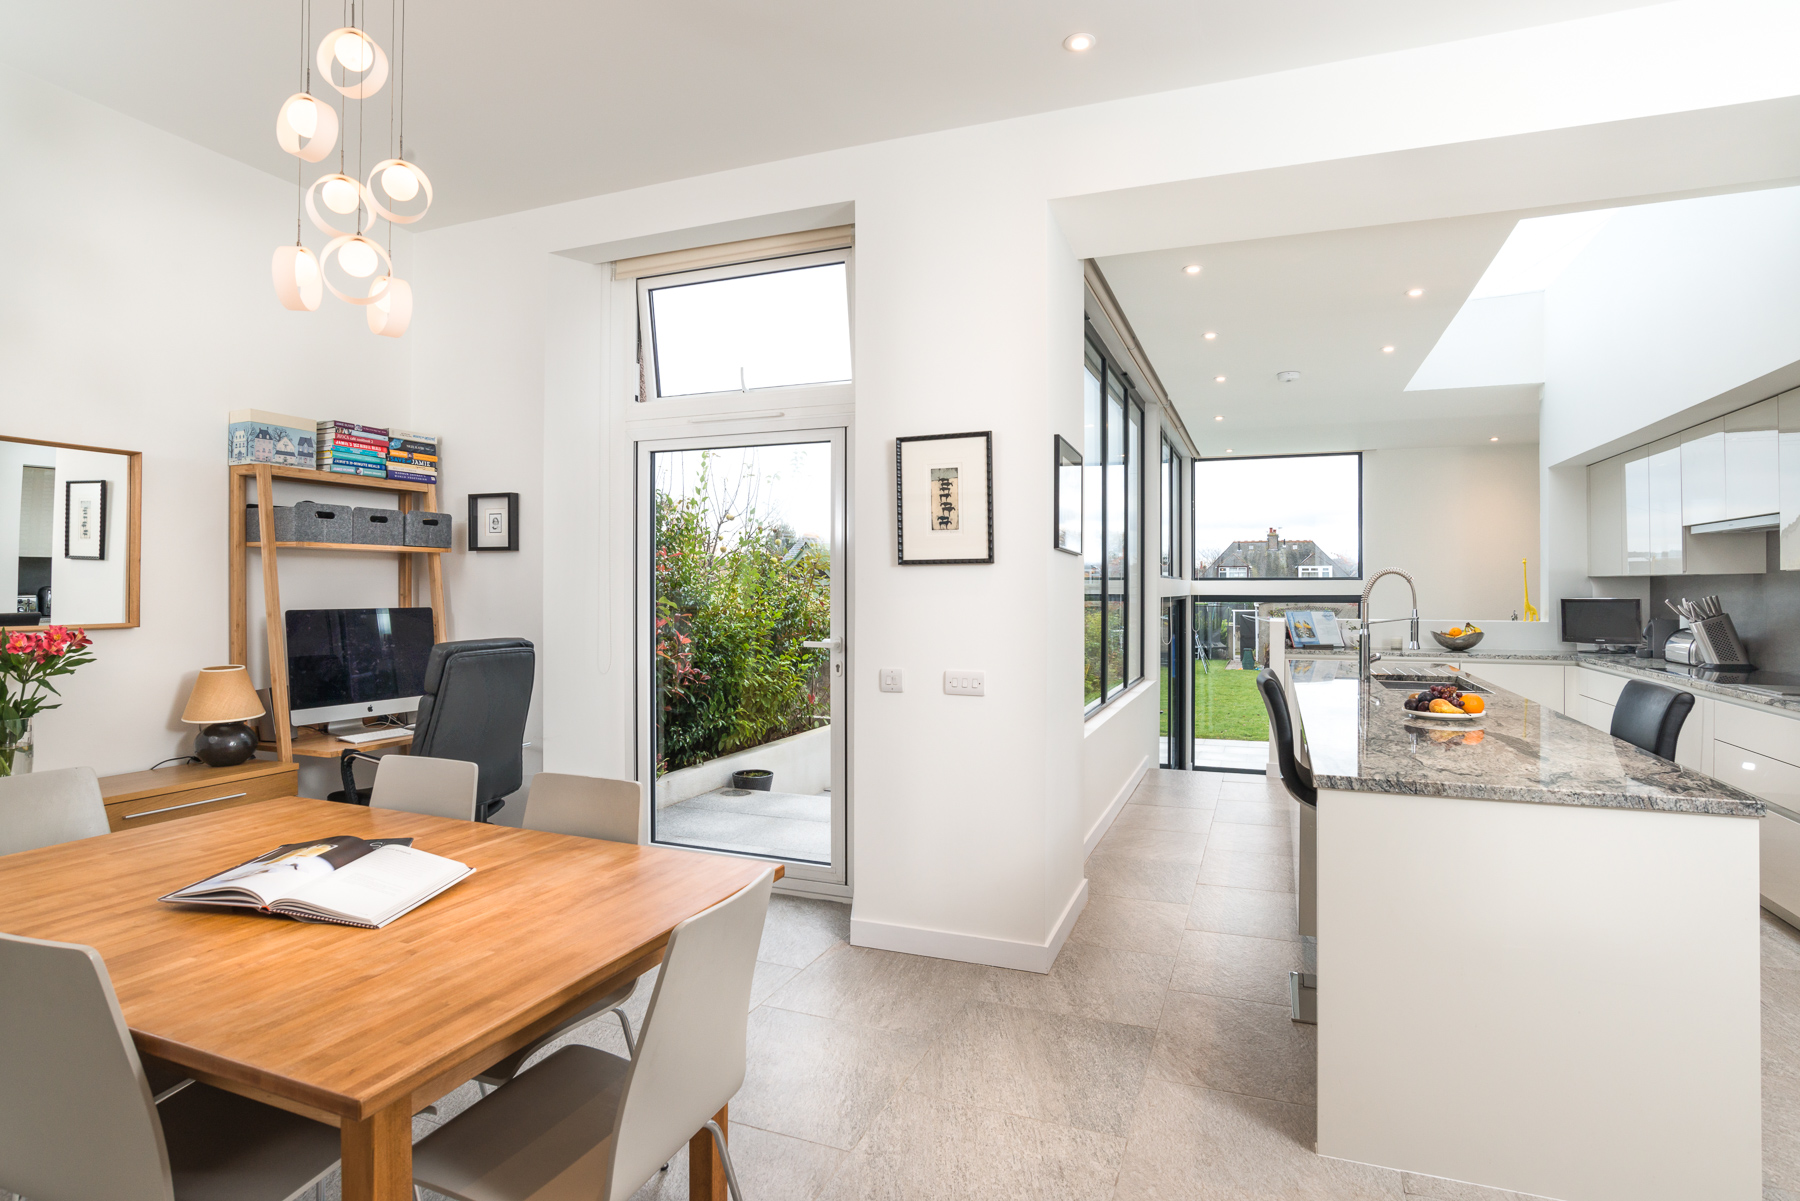 Private Residence | Domus Design | Aberdeen